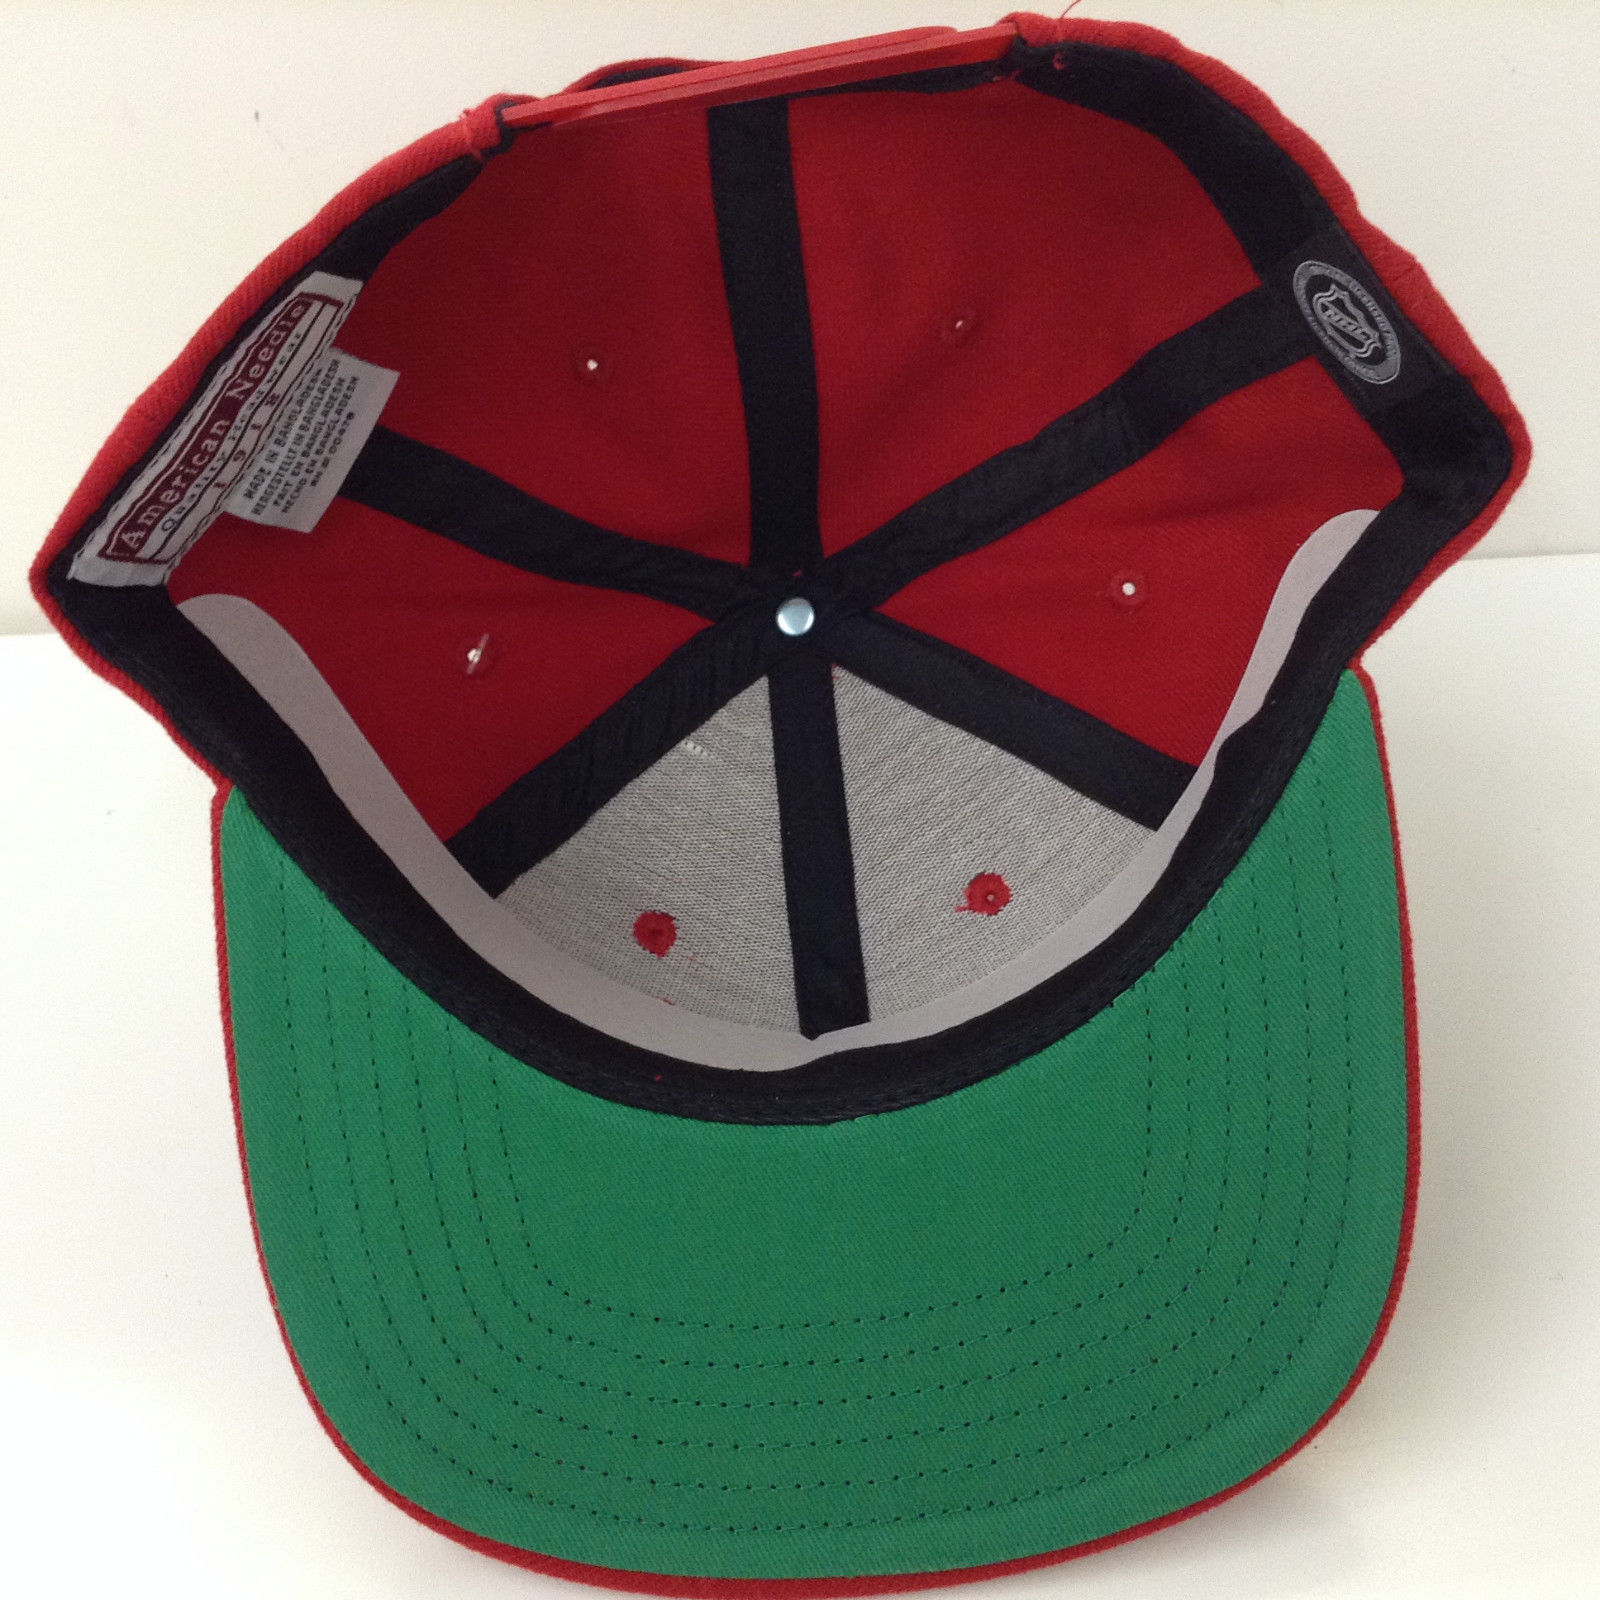 American Needle NHL 400 Red Wings Replica Snapback Adjustable Cap Hat 12858